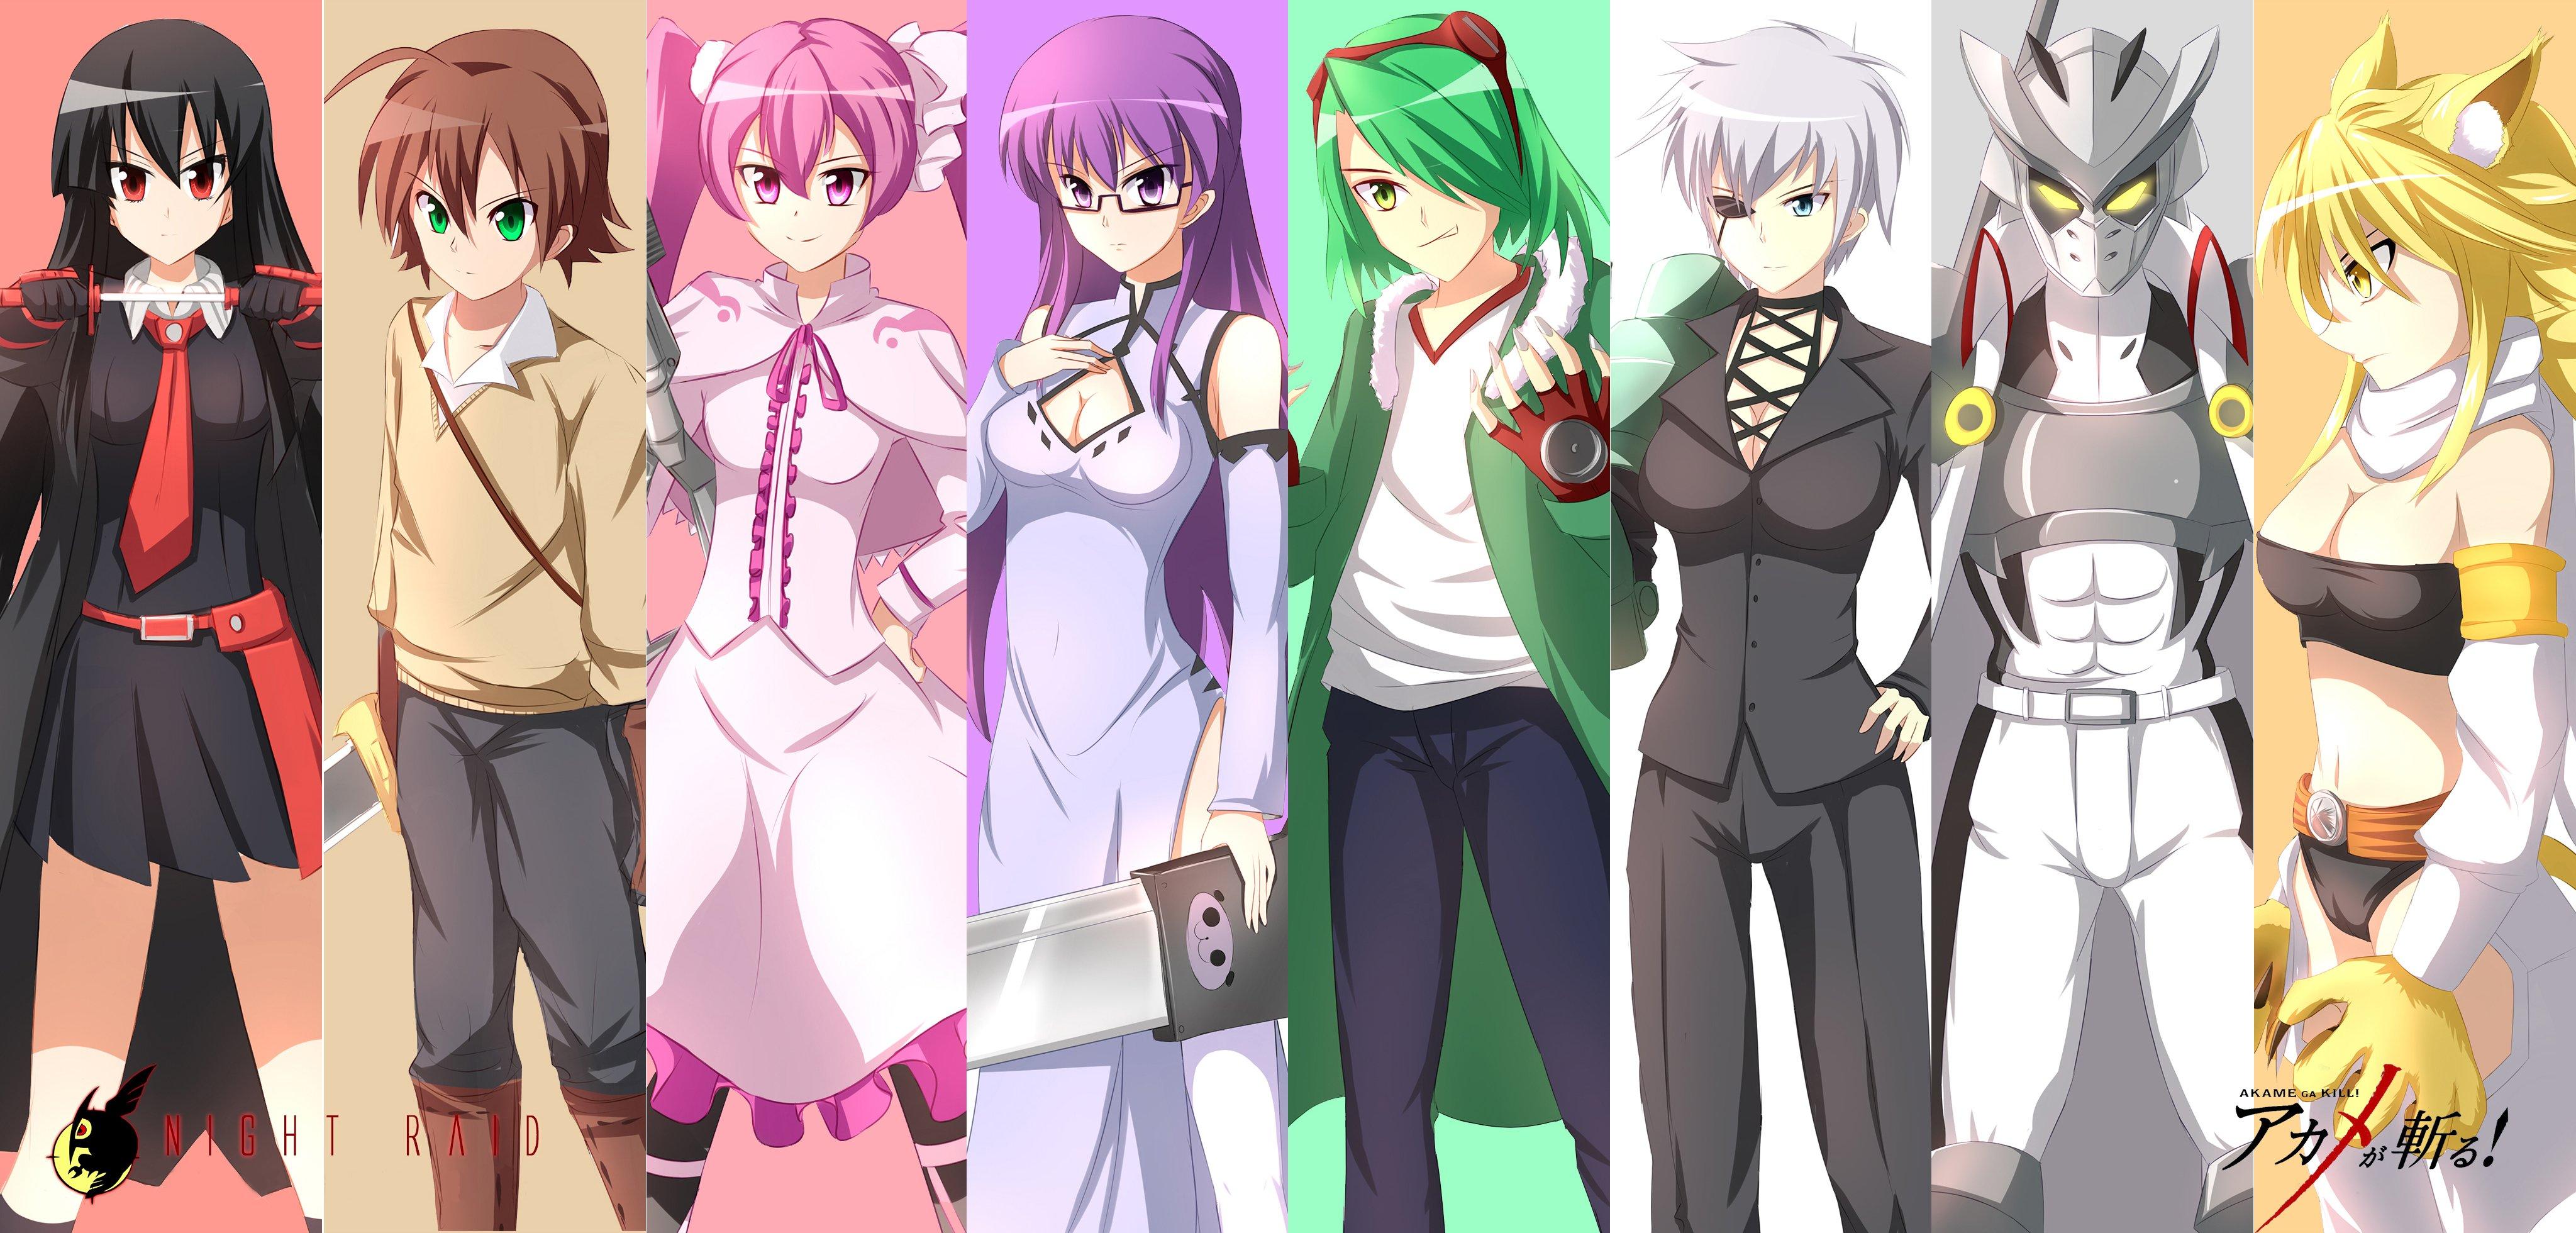 Fondos de pantalla Anime Personajes Akame ga Kill!